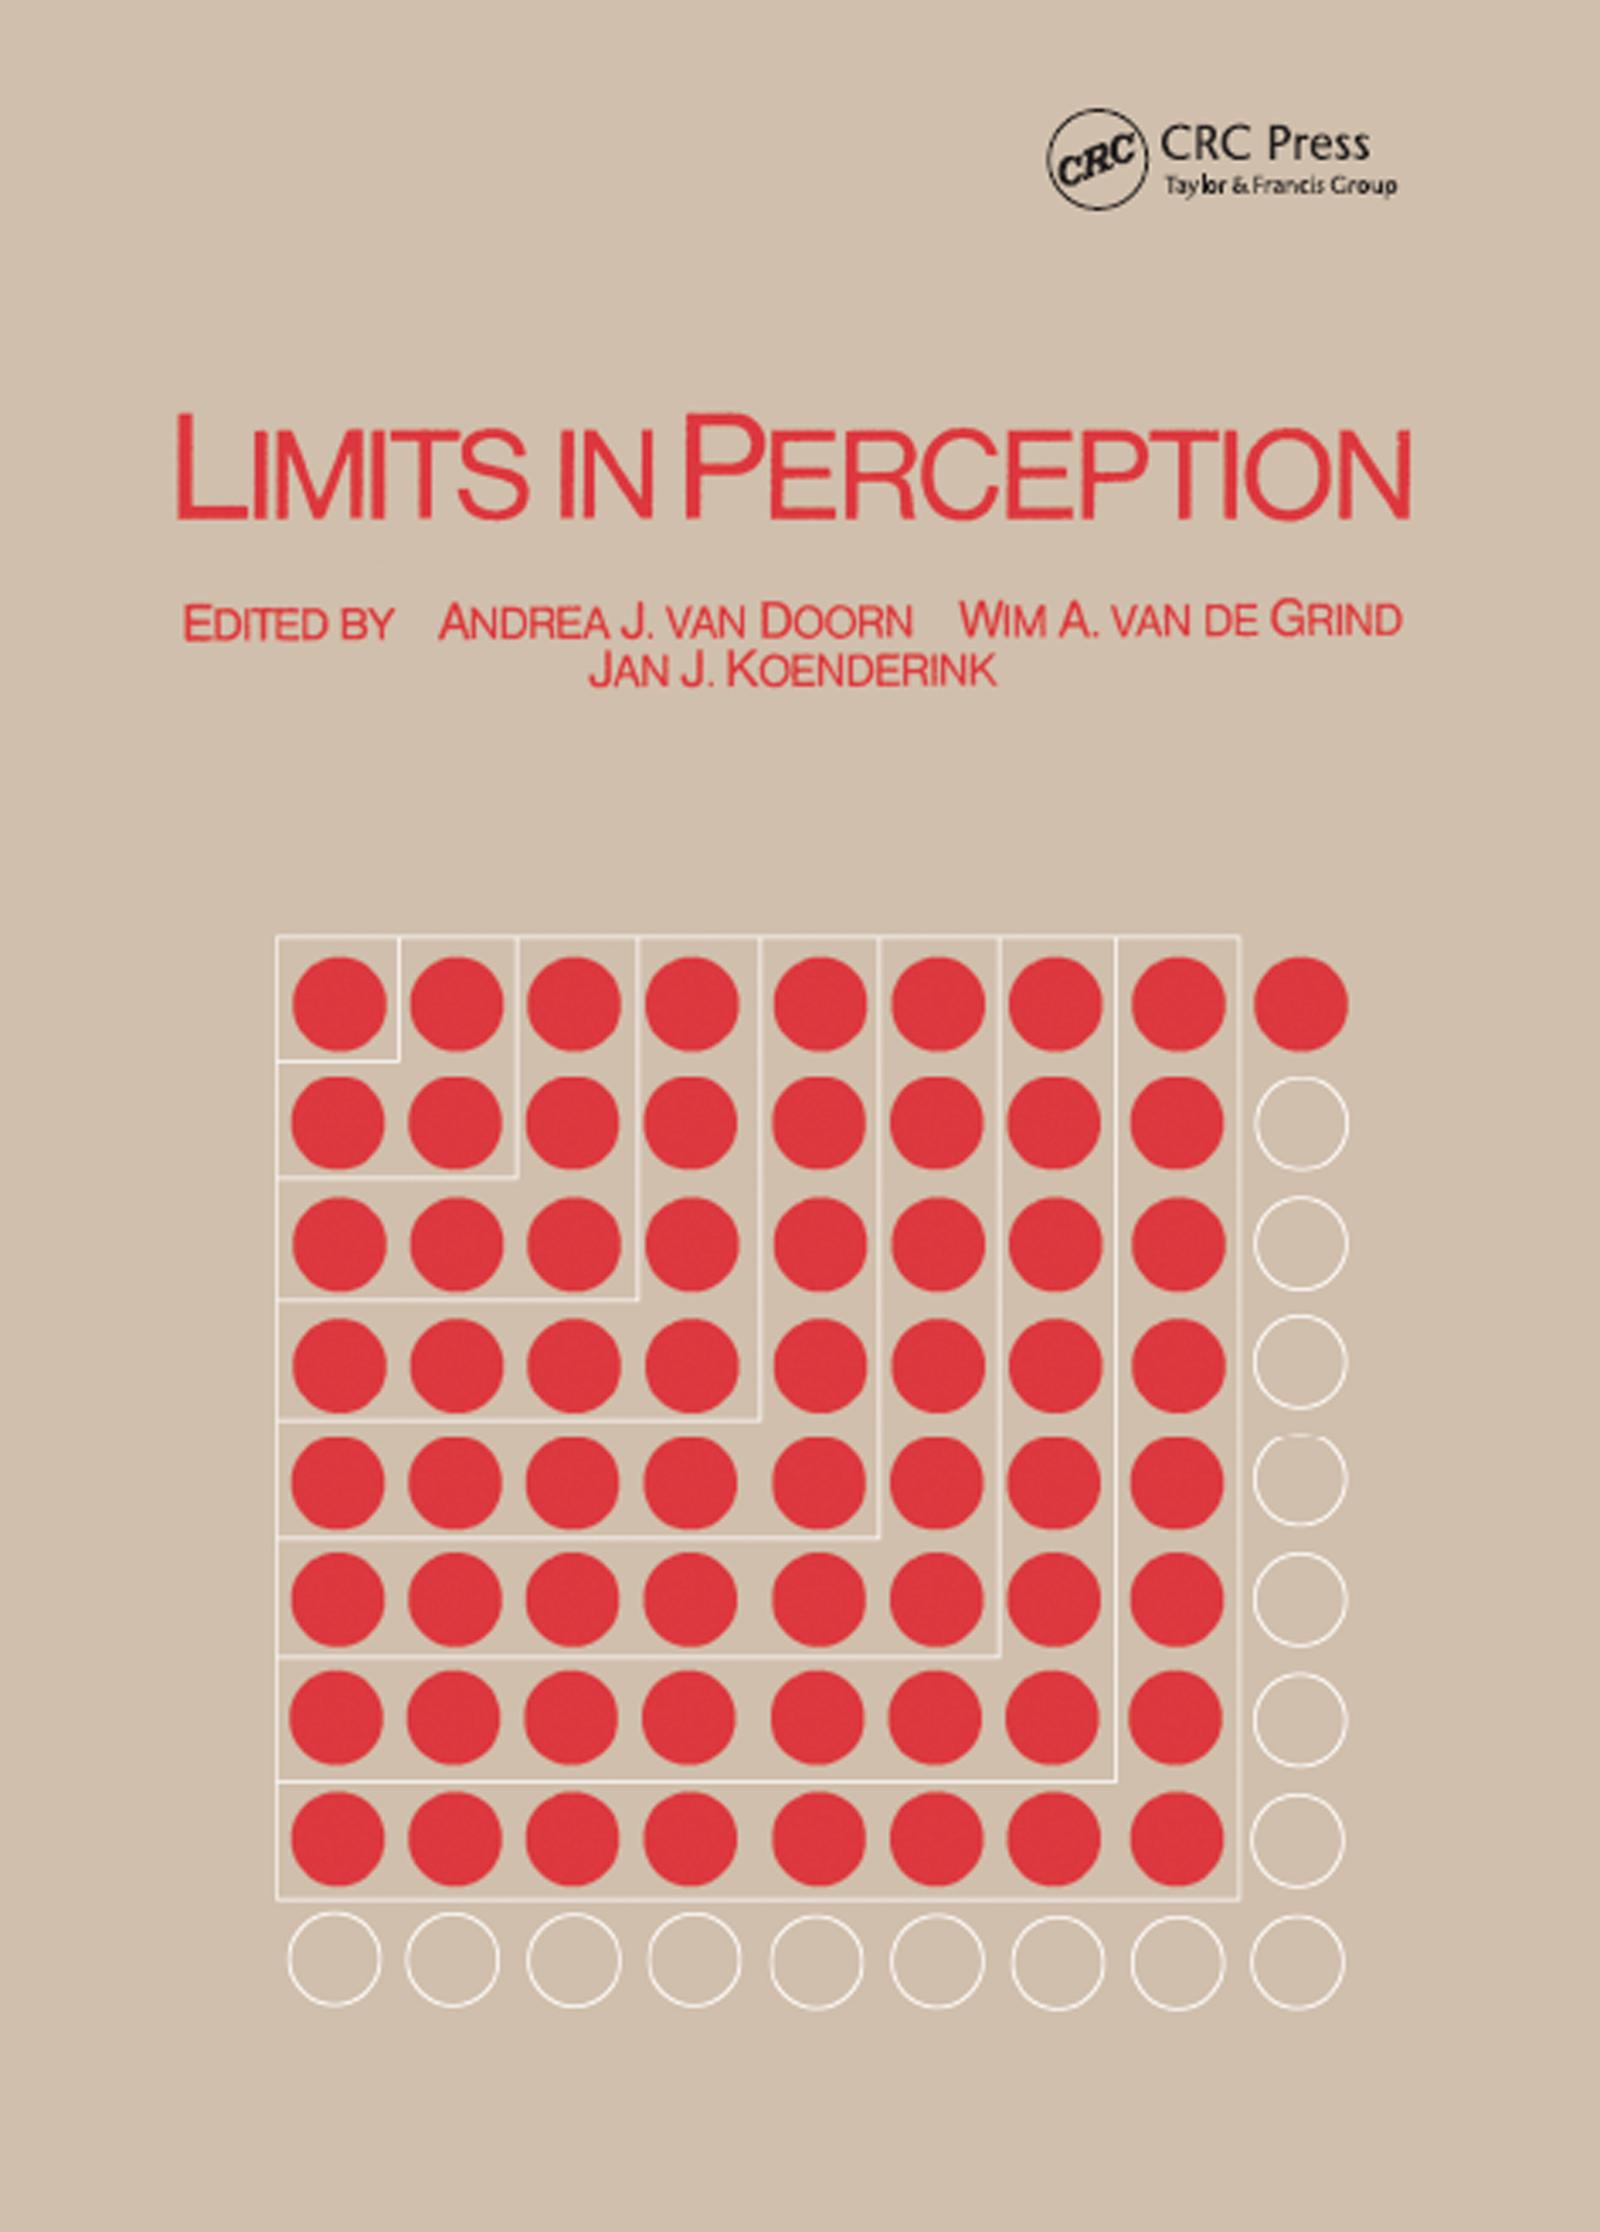 Limits in Perception